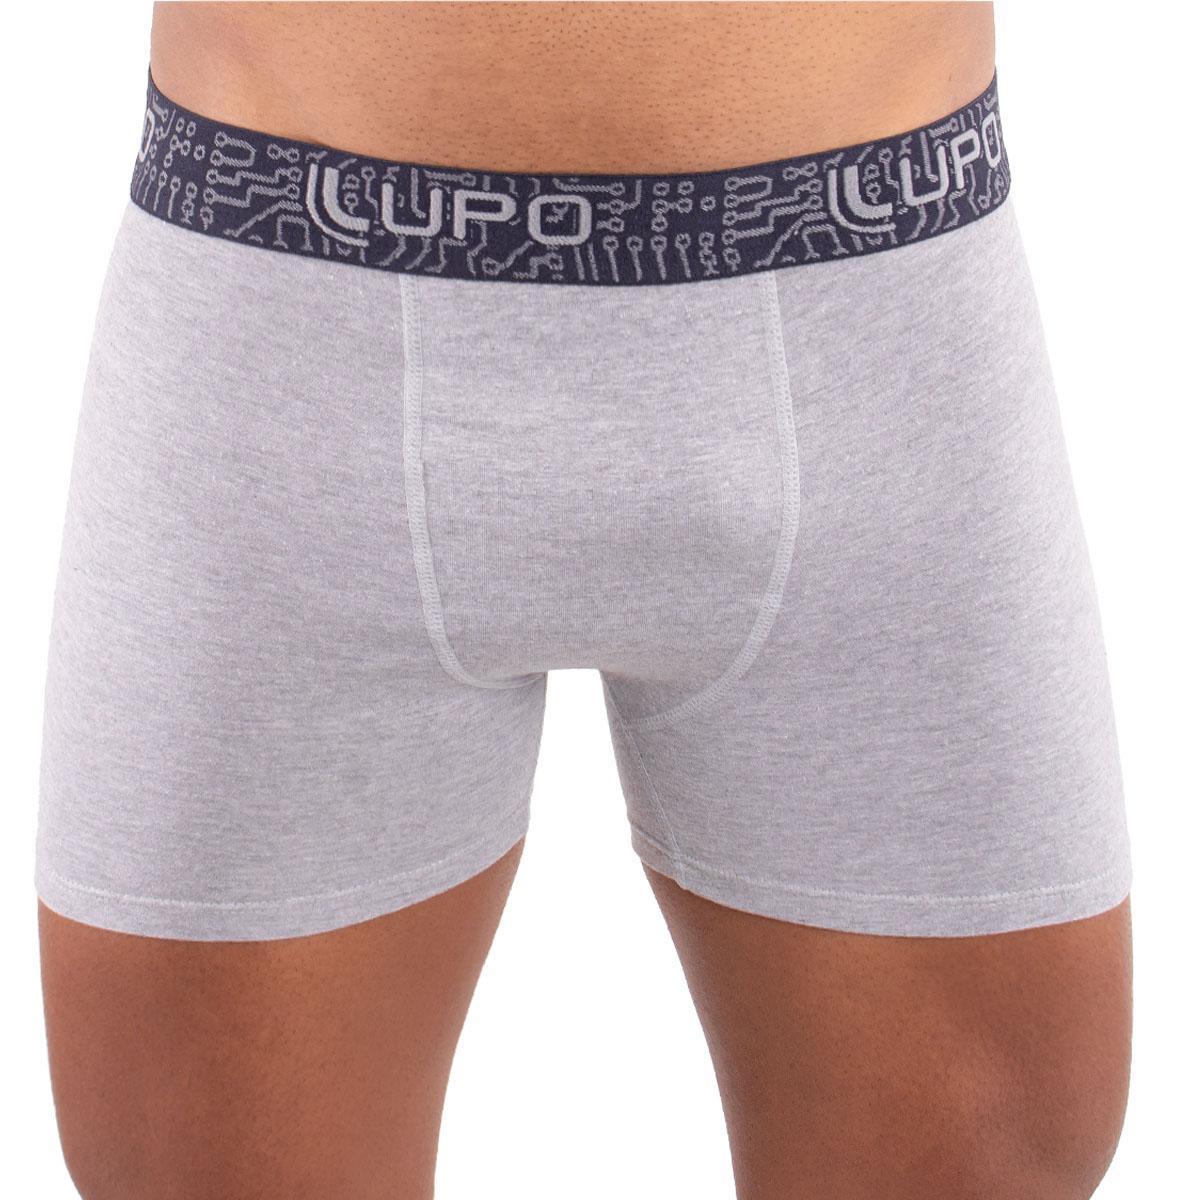 Cueca algodão boxer masculina adulto Lupo .